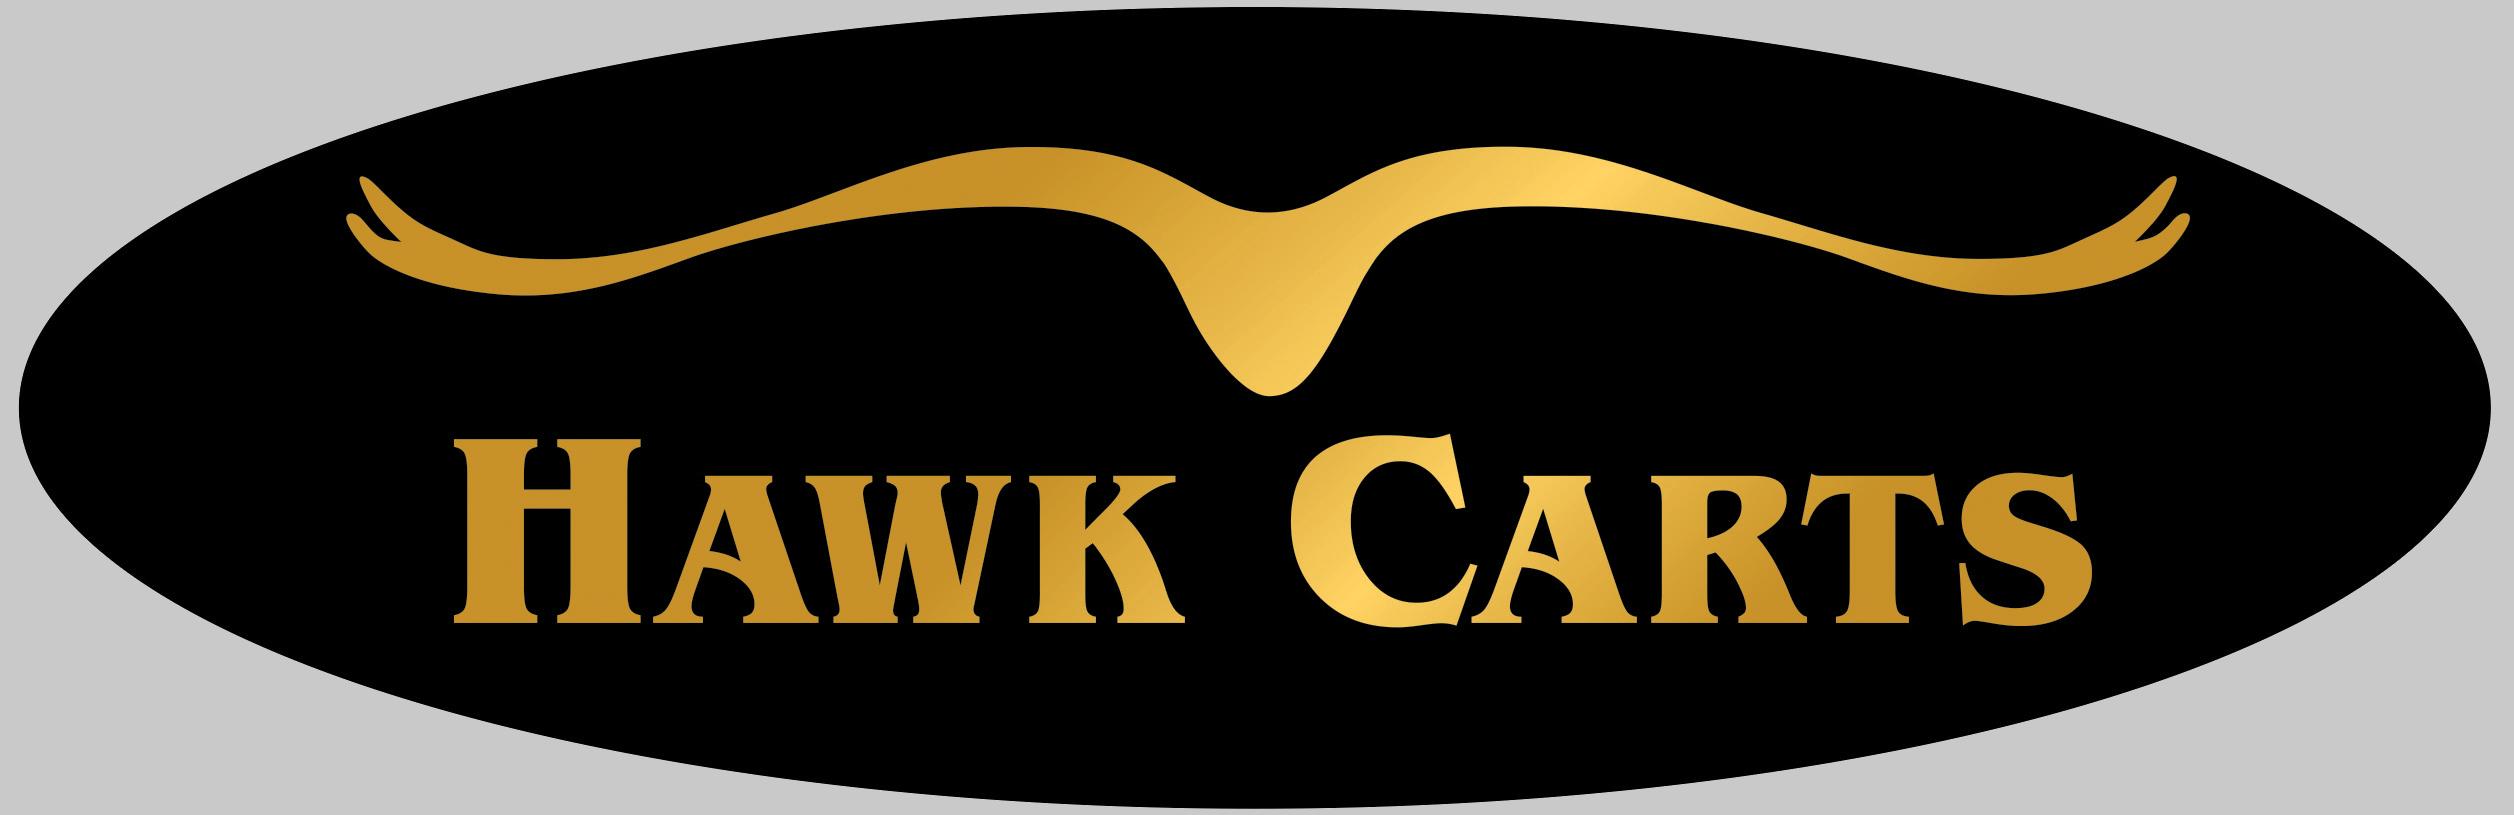 Hawk Carts